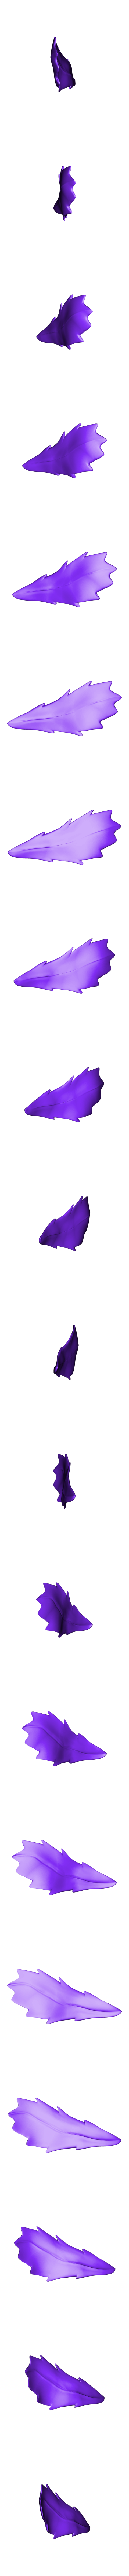 topleaf_1.stl Download free STL file It's a flower! • 3D printing template, 3DJourney